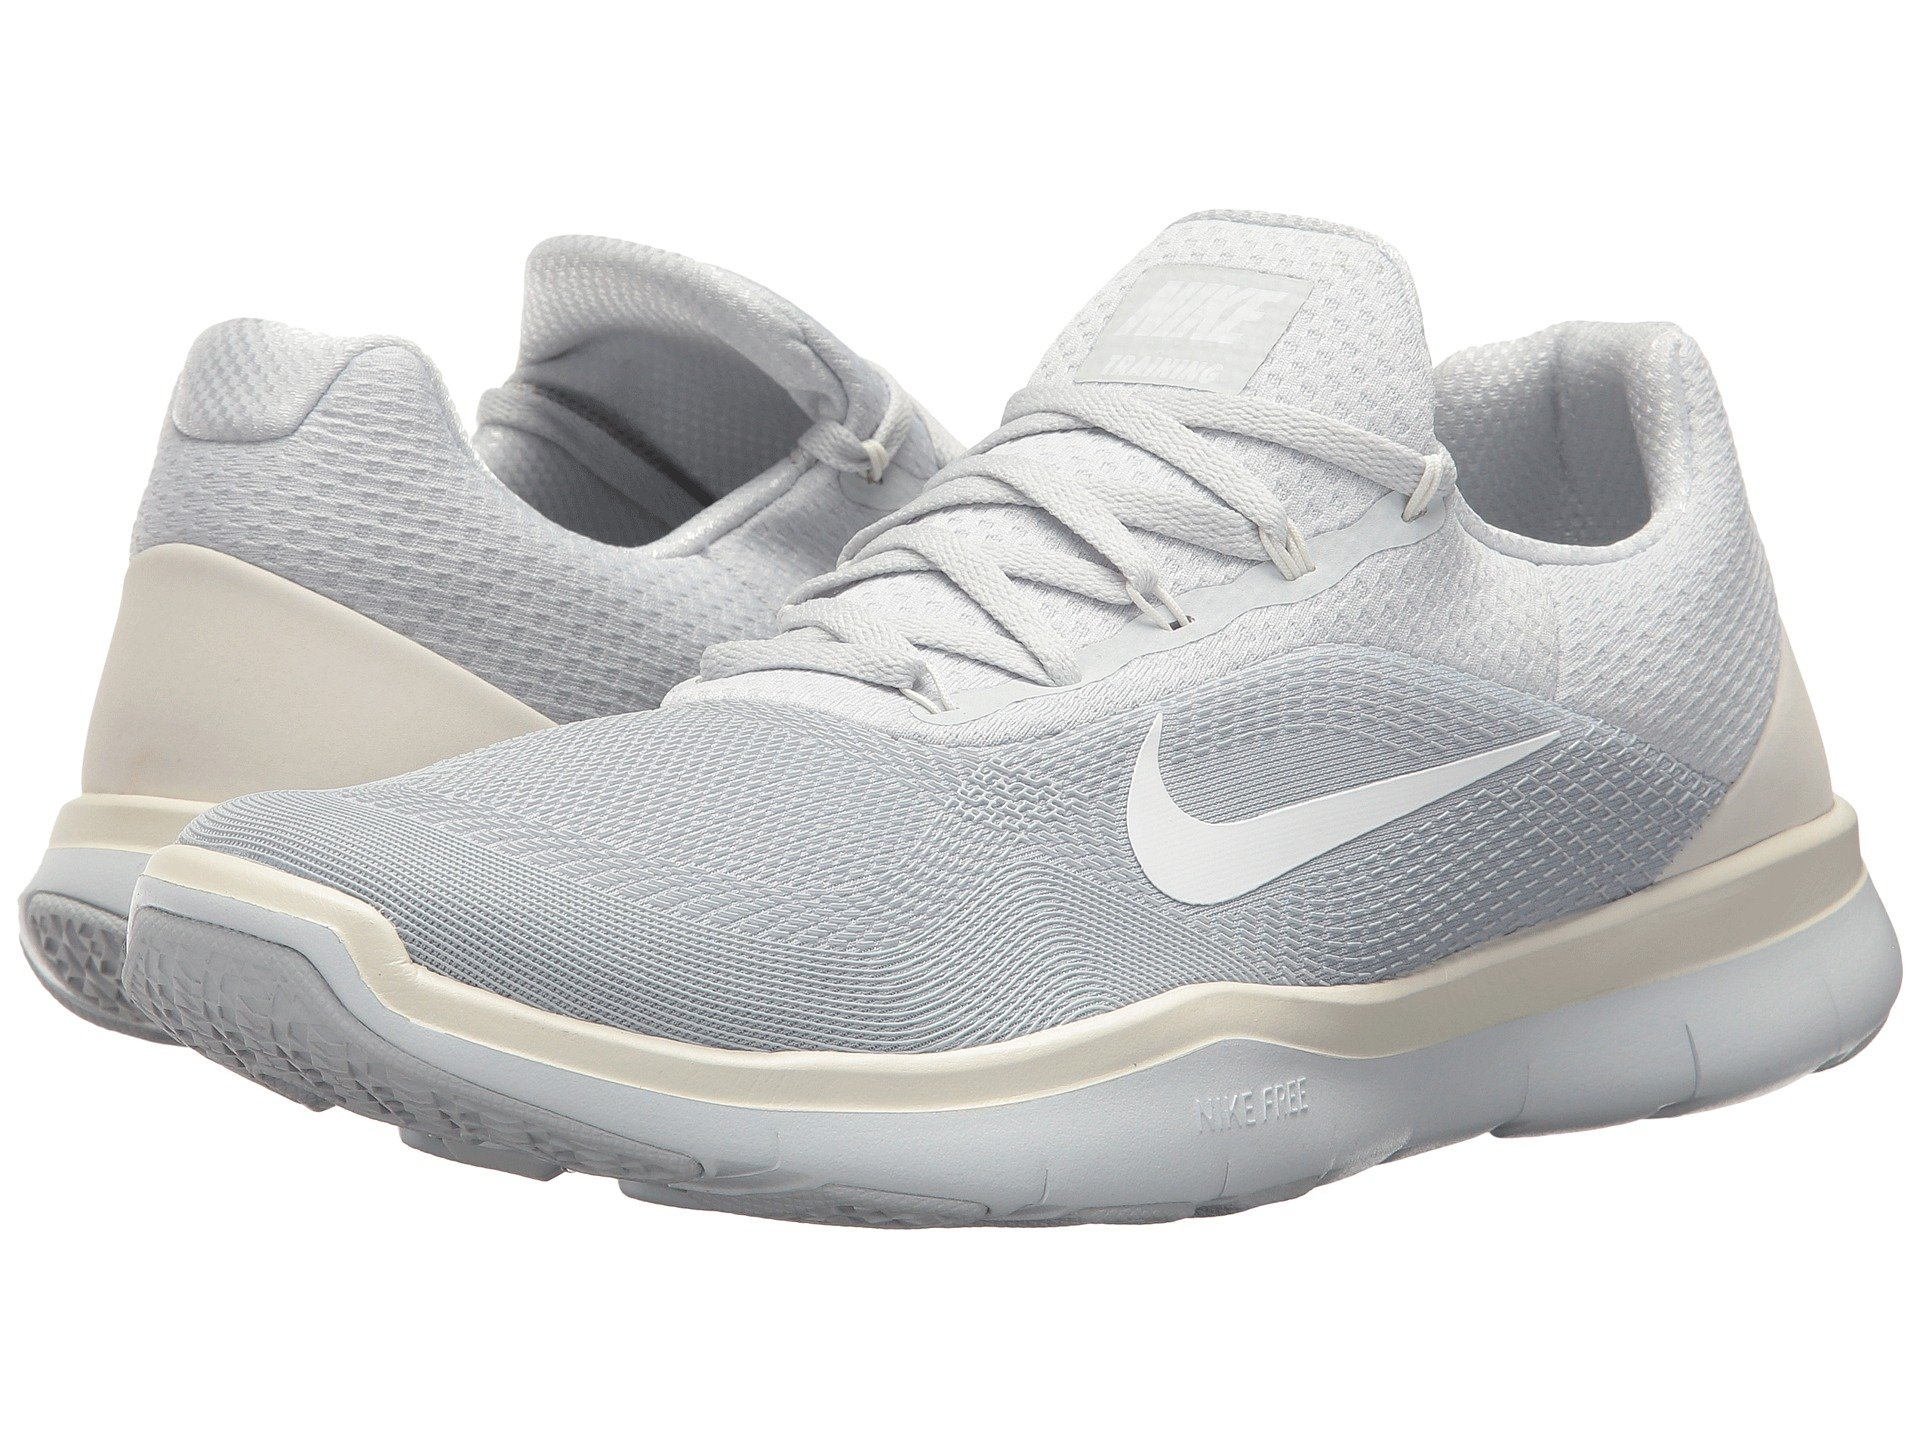 2945697d4f92 Nike Free Trainer V7